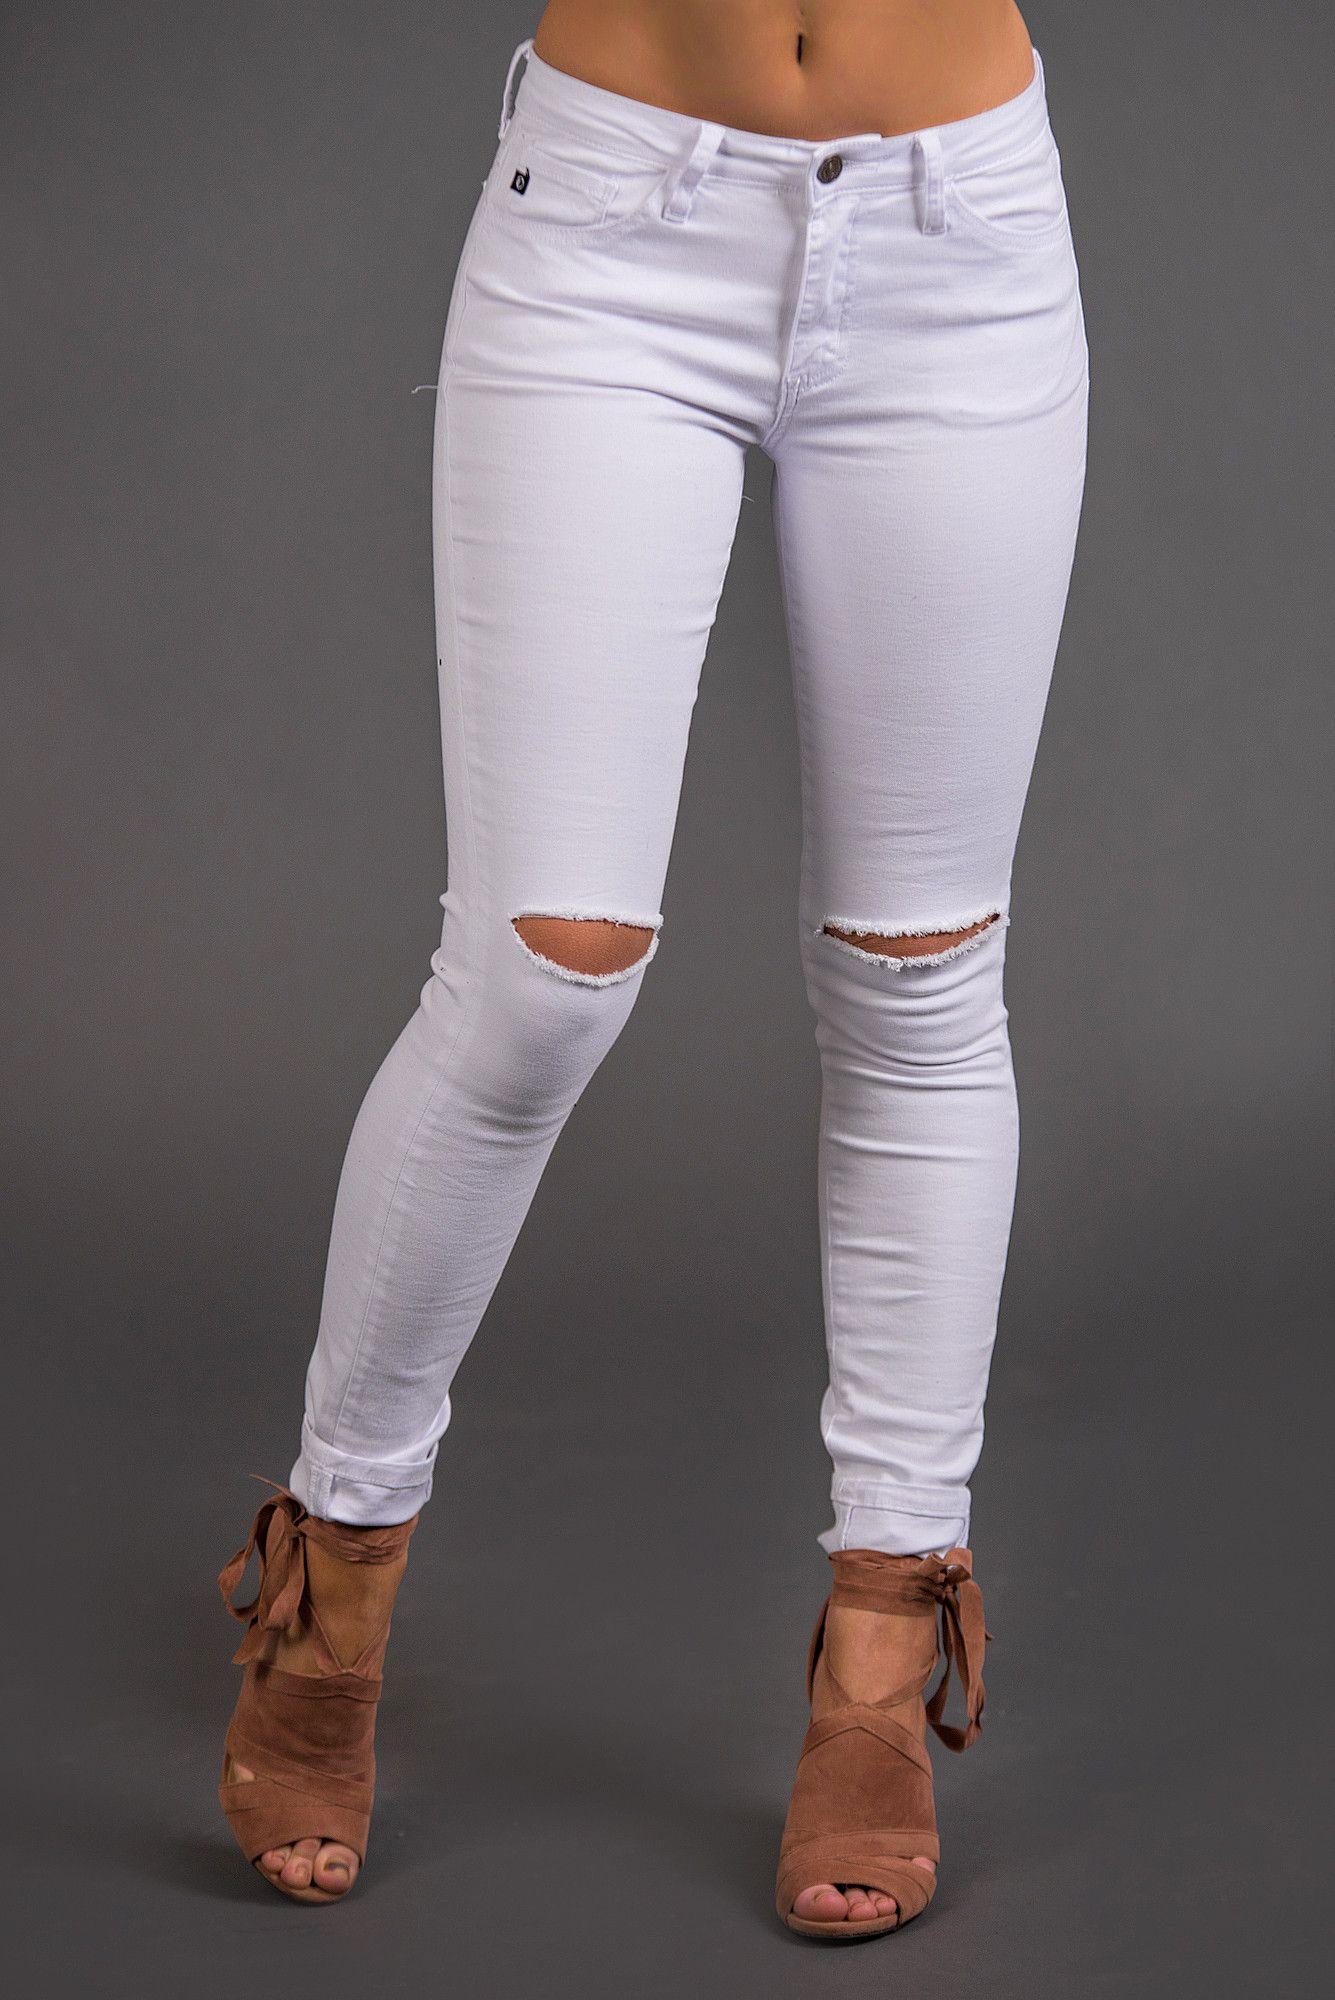 f8223828beb Fifth Avenue Lightly Distressed Skinny KanCan Jeans (White) - NanaMacs.com  - 3